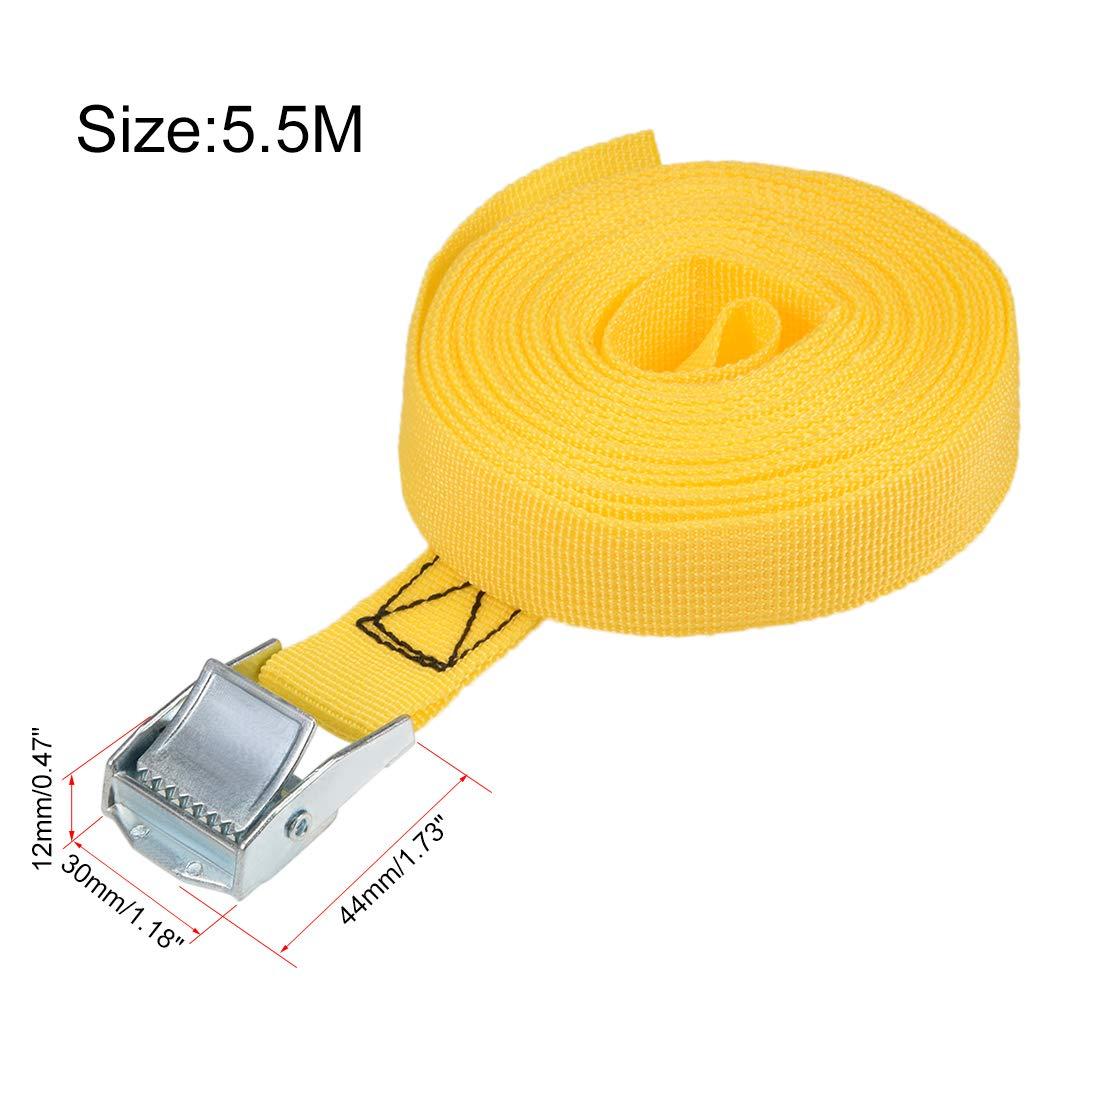 2pcs sourcing map 8mx25mm amarre correa carga amarre w cam hebilla 250 kg carga de trabajo amarillo